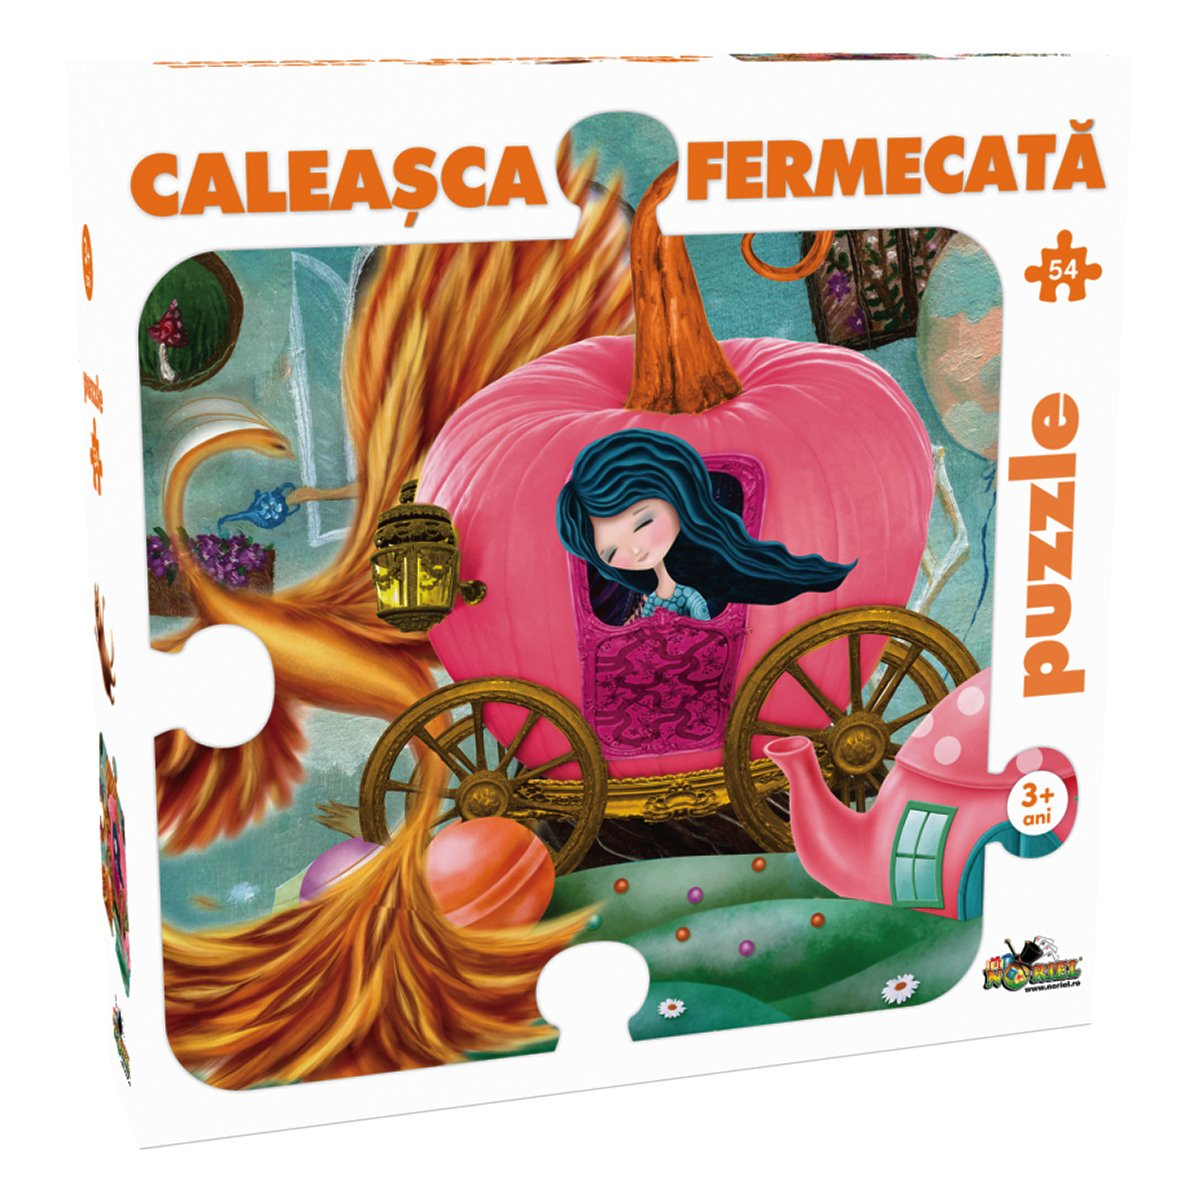 Puzzle Noriel - Caleasca fermecata (54 piese) imagine 2021